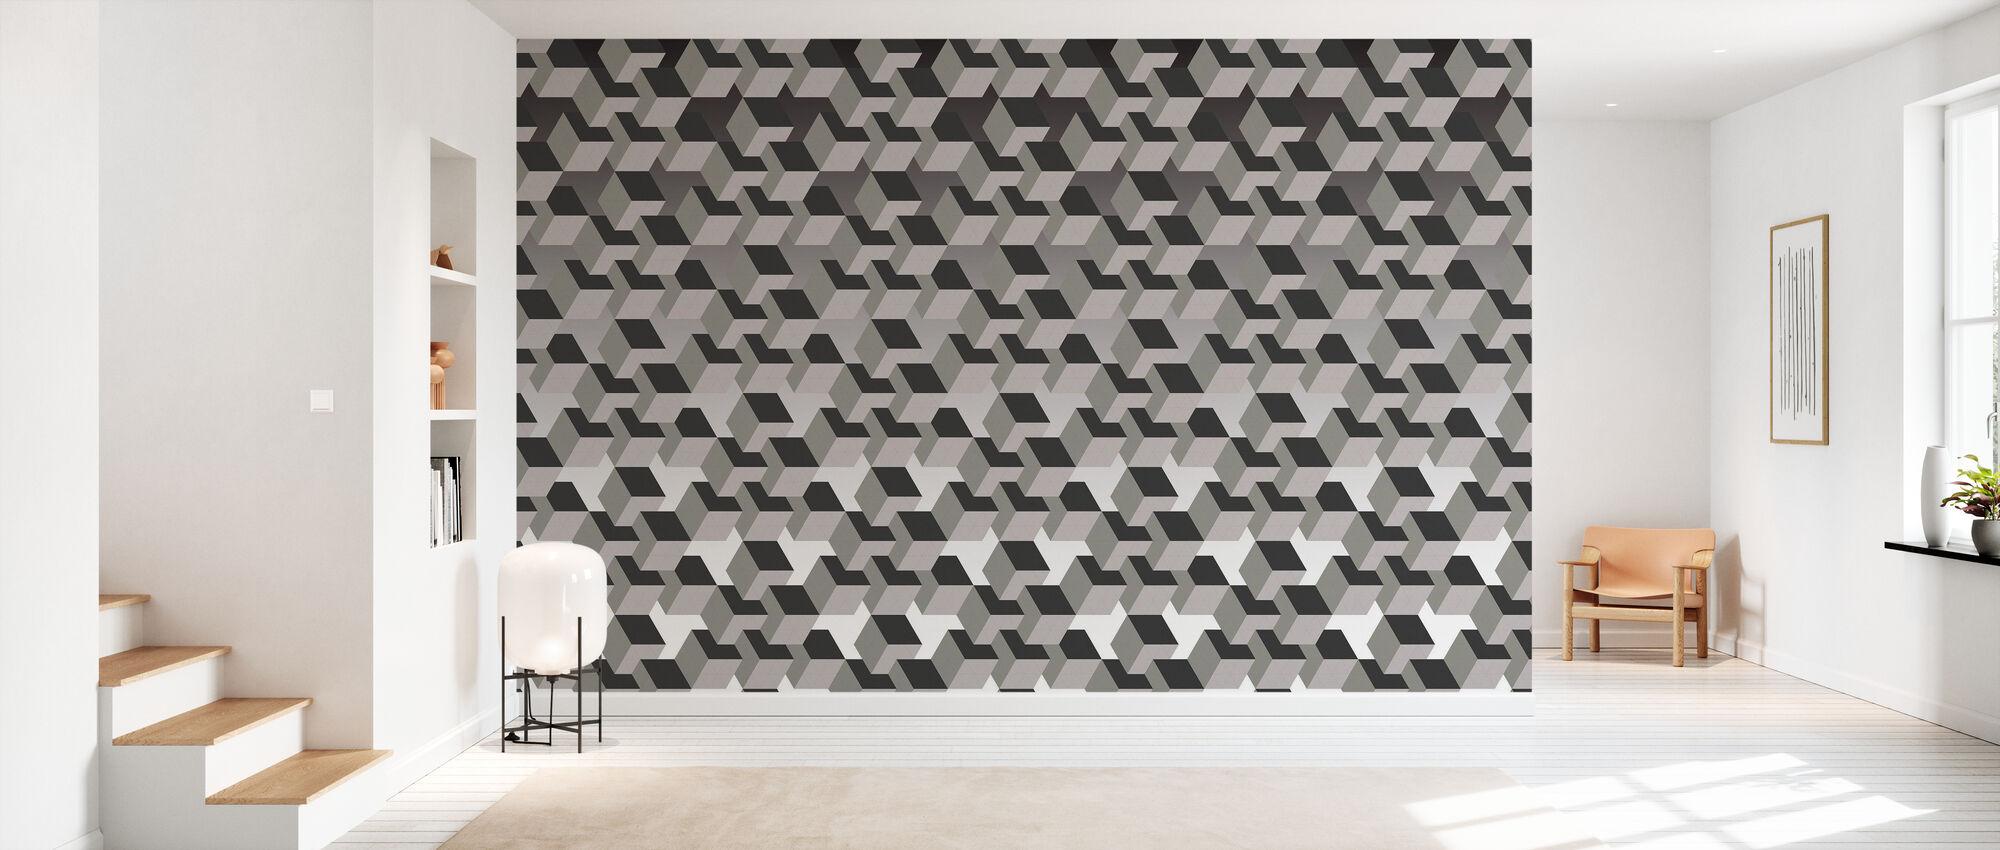 Eschmash - Wallpaper - Hallway